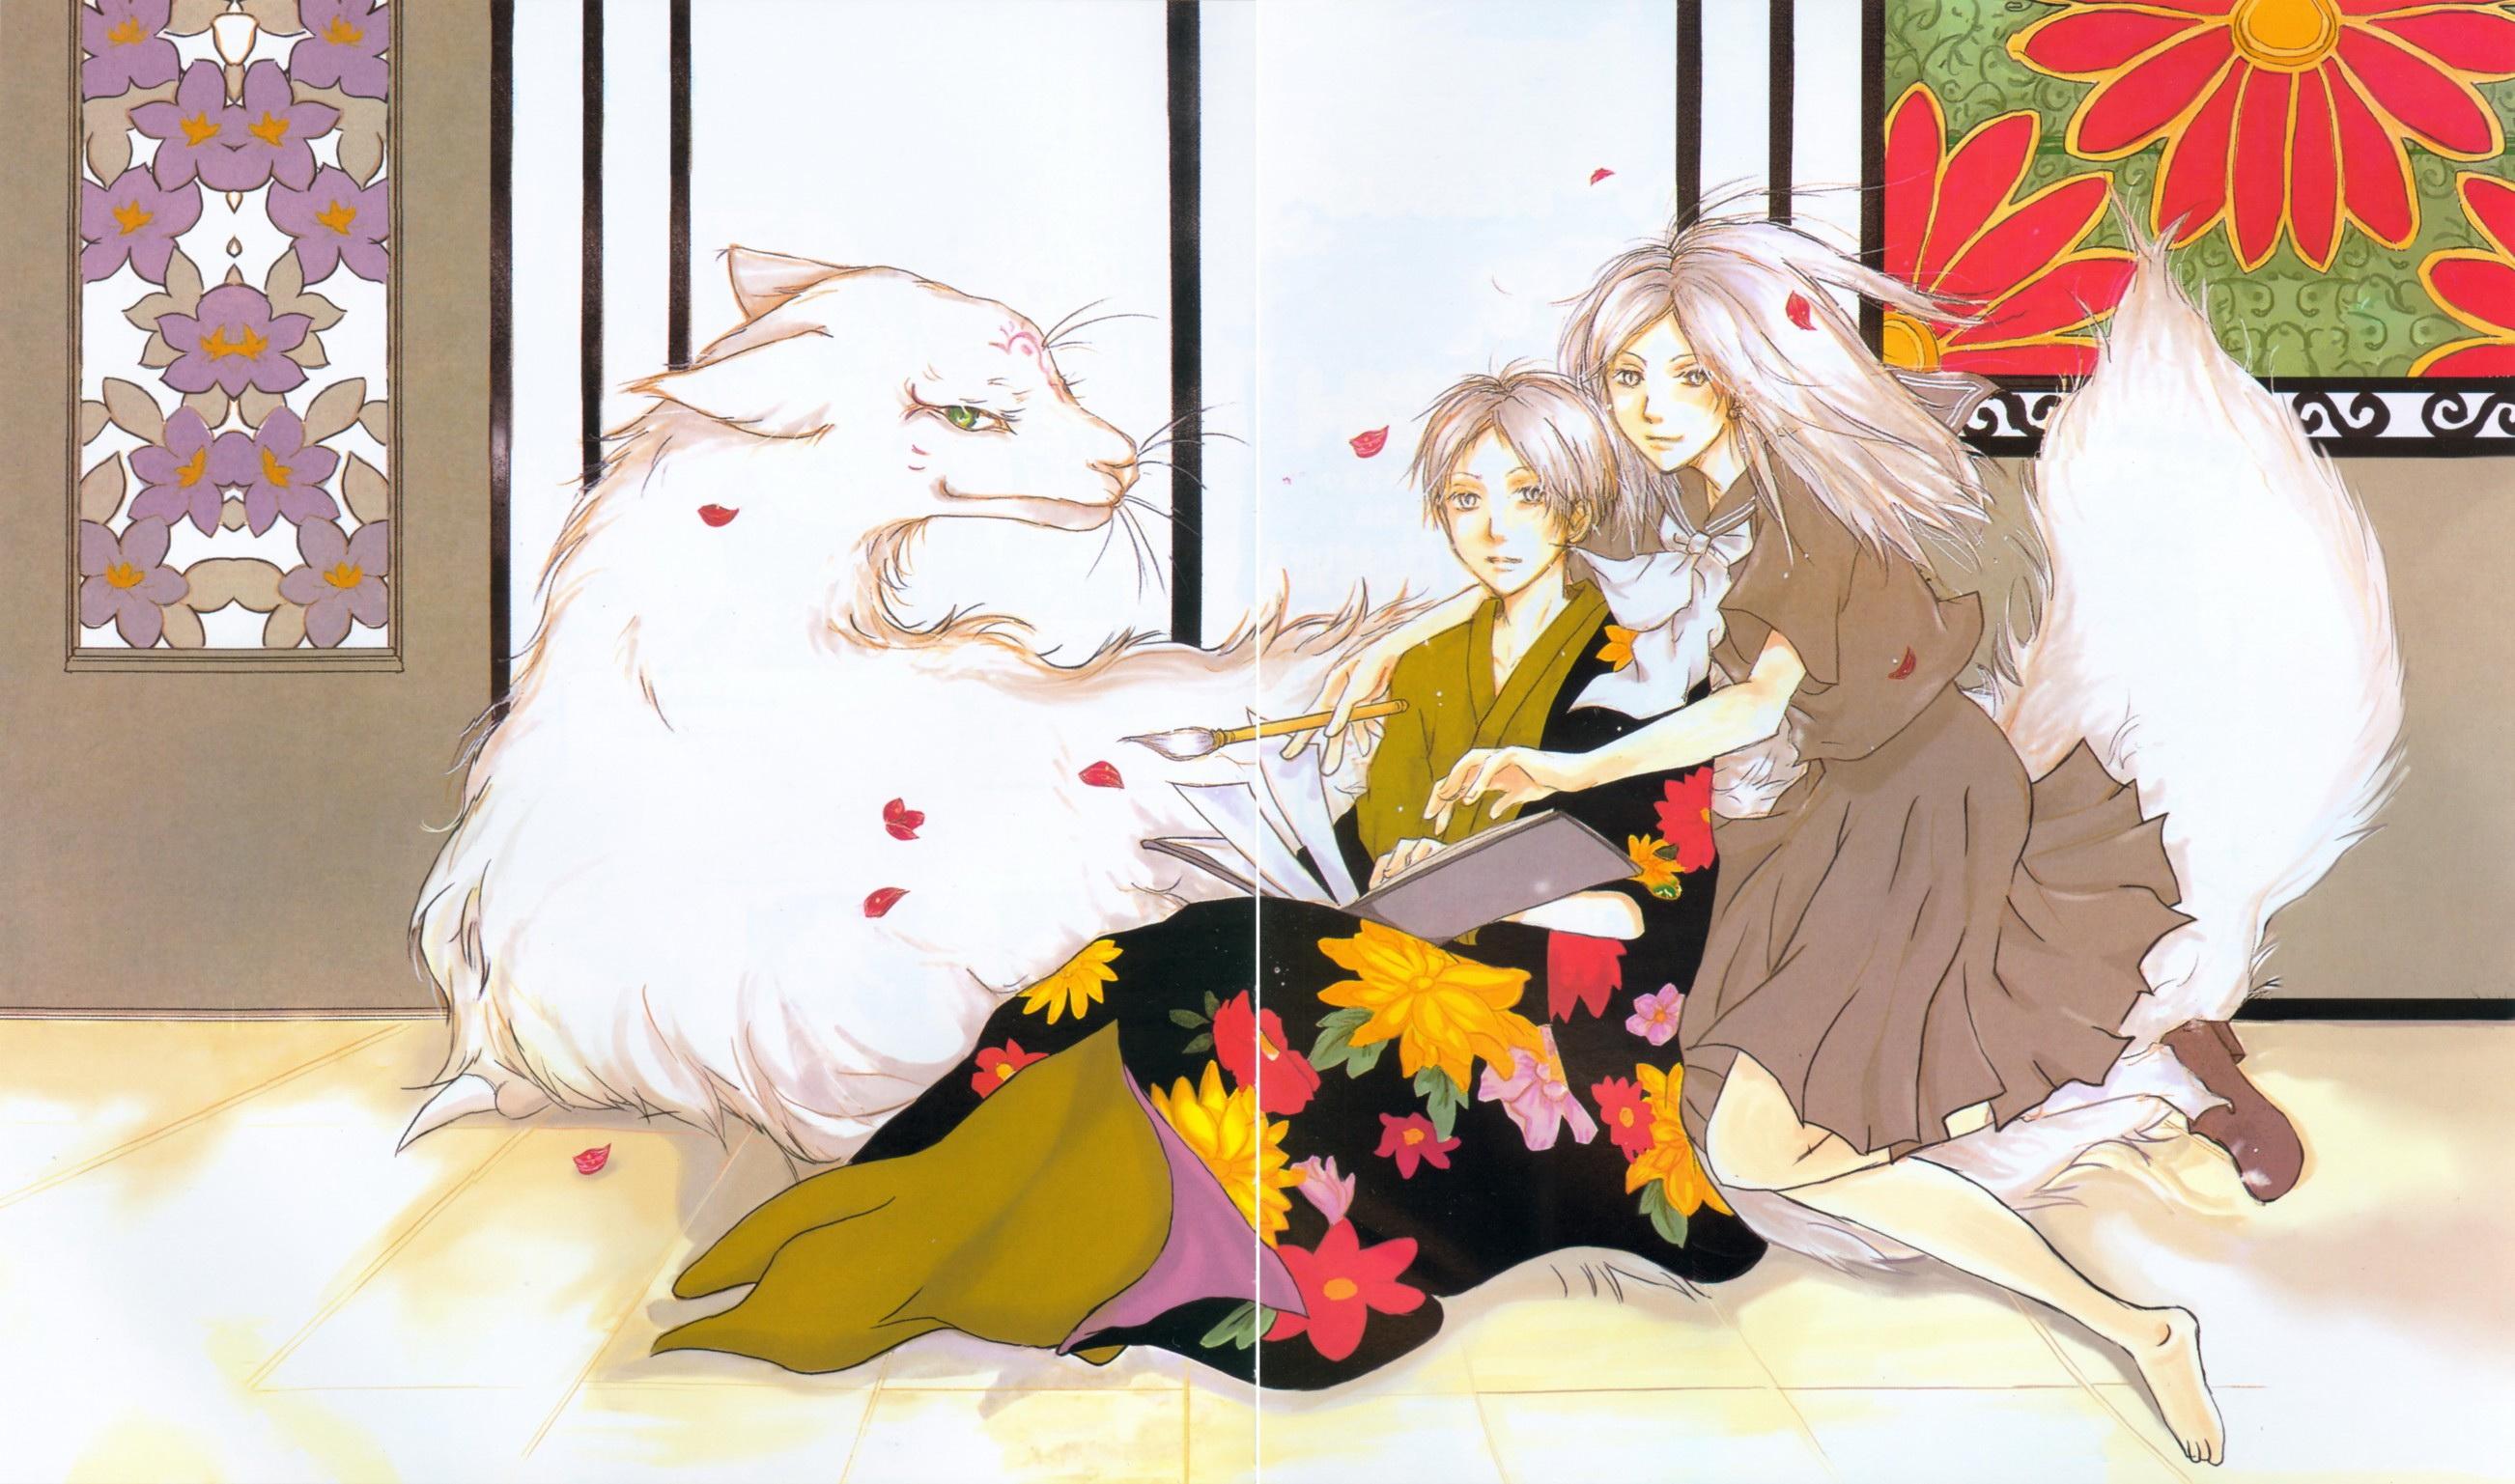 картинки аниме тетрадь дружбы нацумэ: